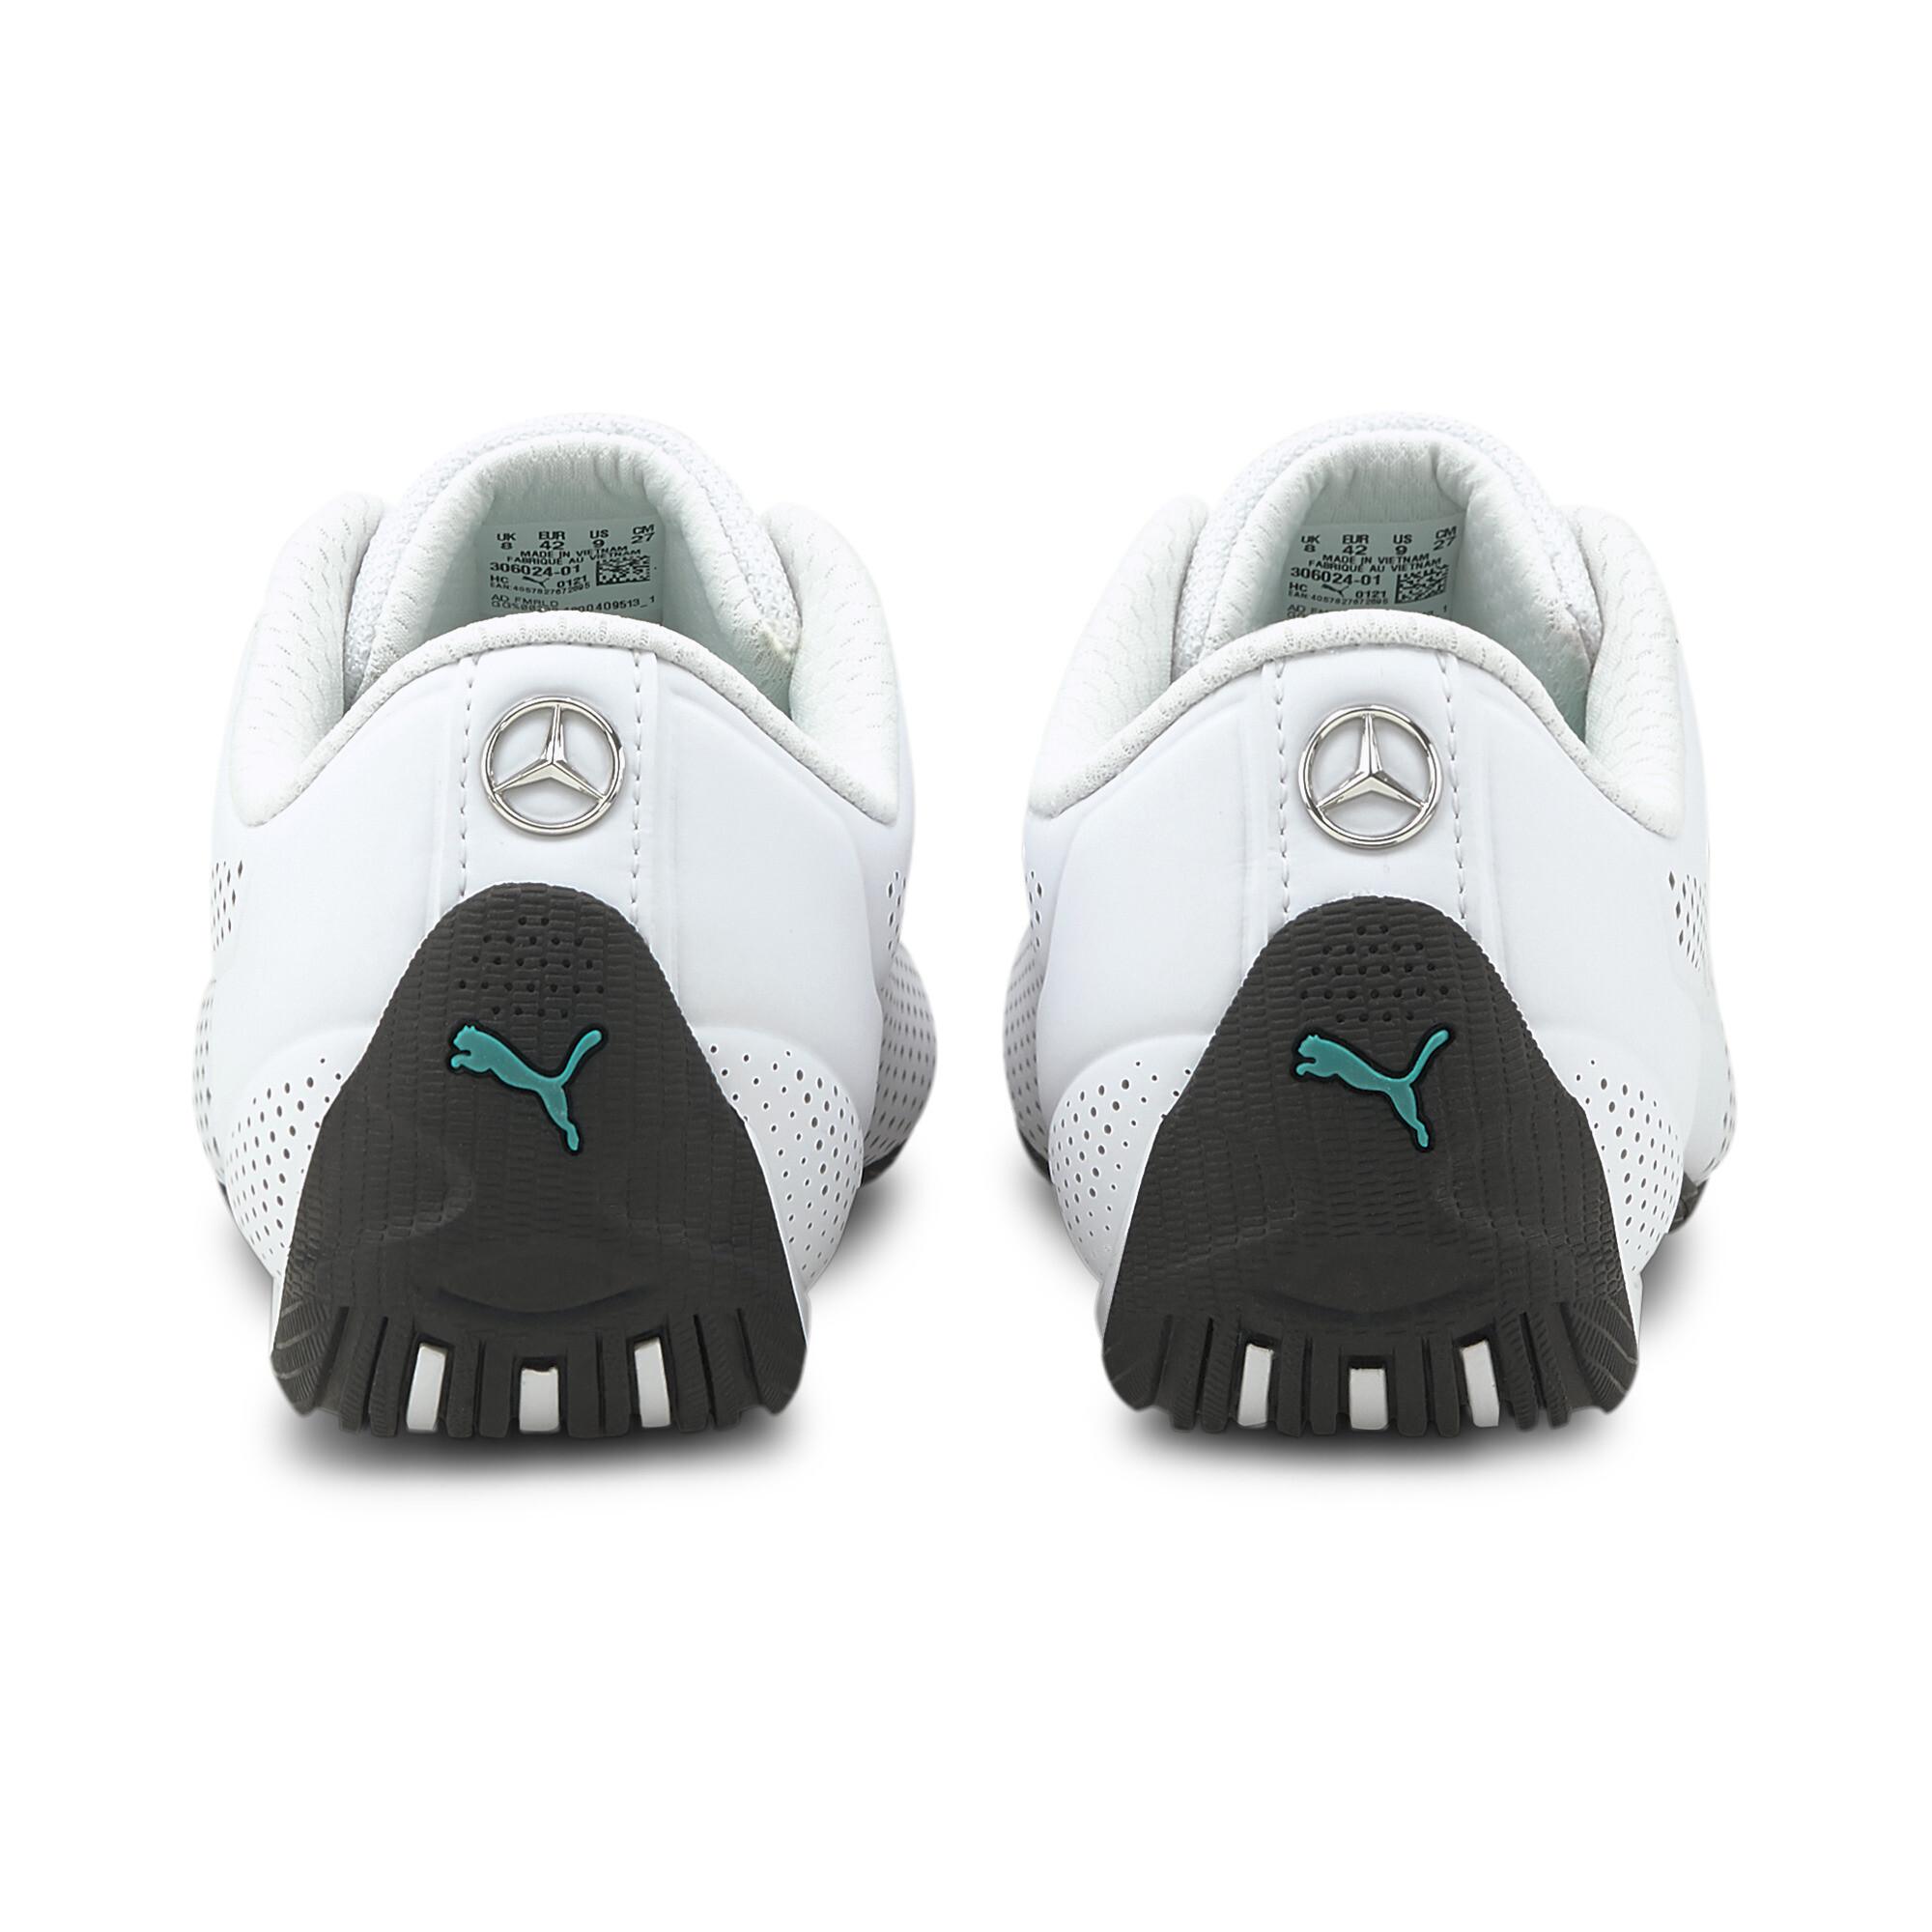 PUMA-MERCEDES-AMG-PETRONAS-Drift-Cat-Ultra-Sneaker-Unisex-Schuhe-Neu Indexbild 18